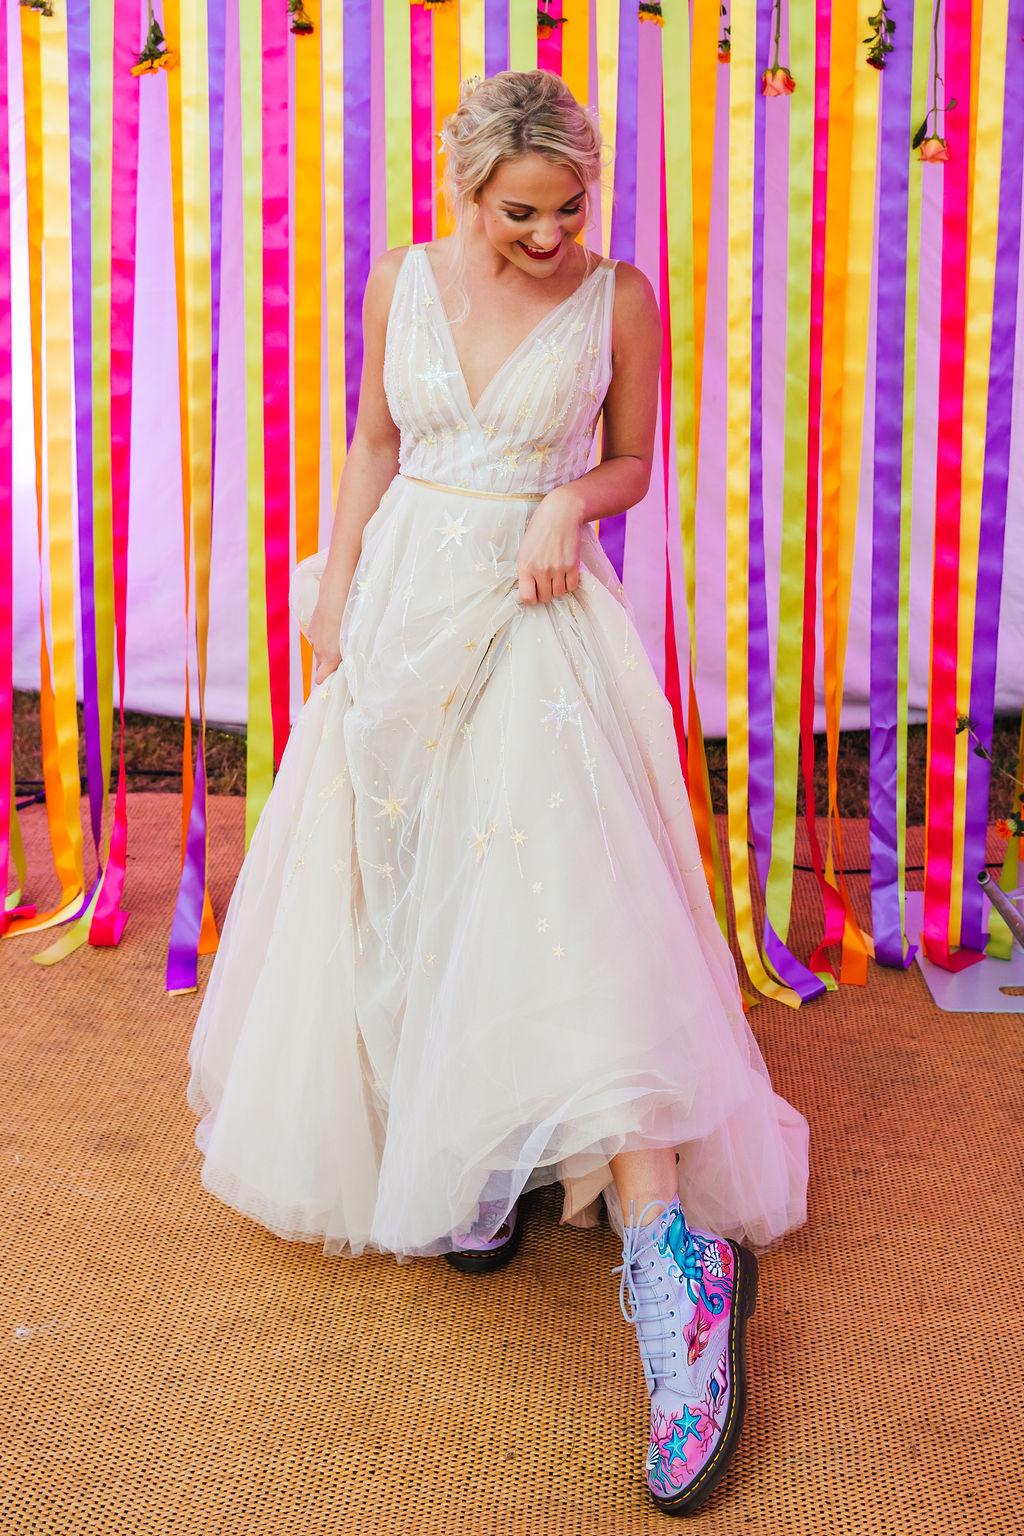 bright festival wedding - colourful wedding - hand painted bridal shoes - celestial wedding dress - alternative bridal wear